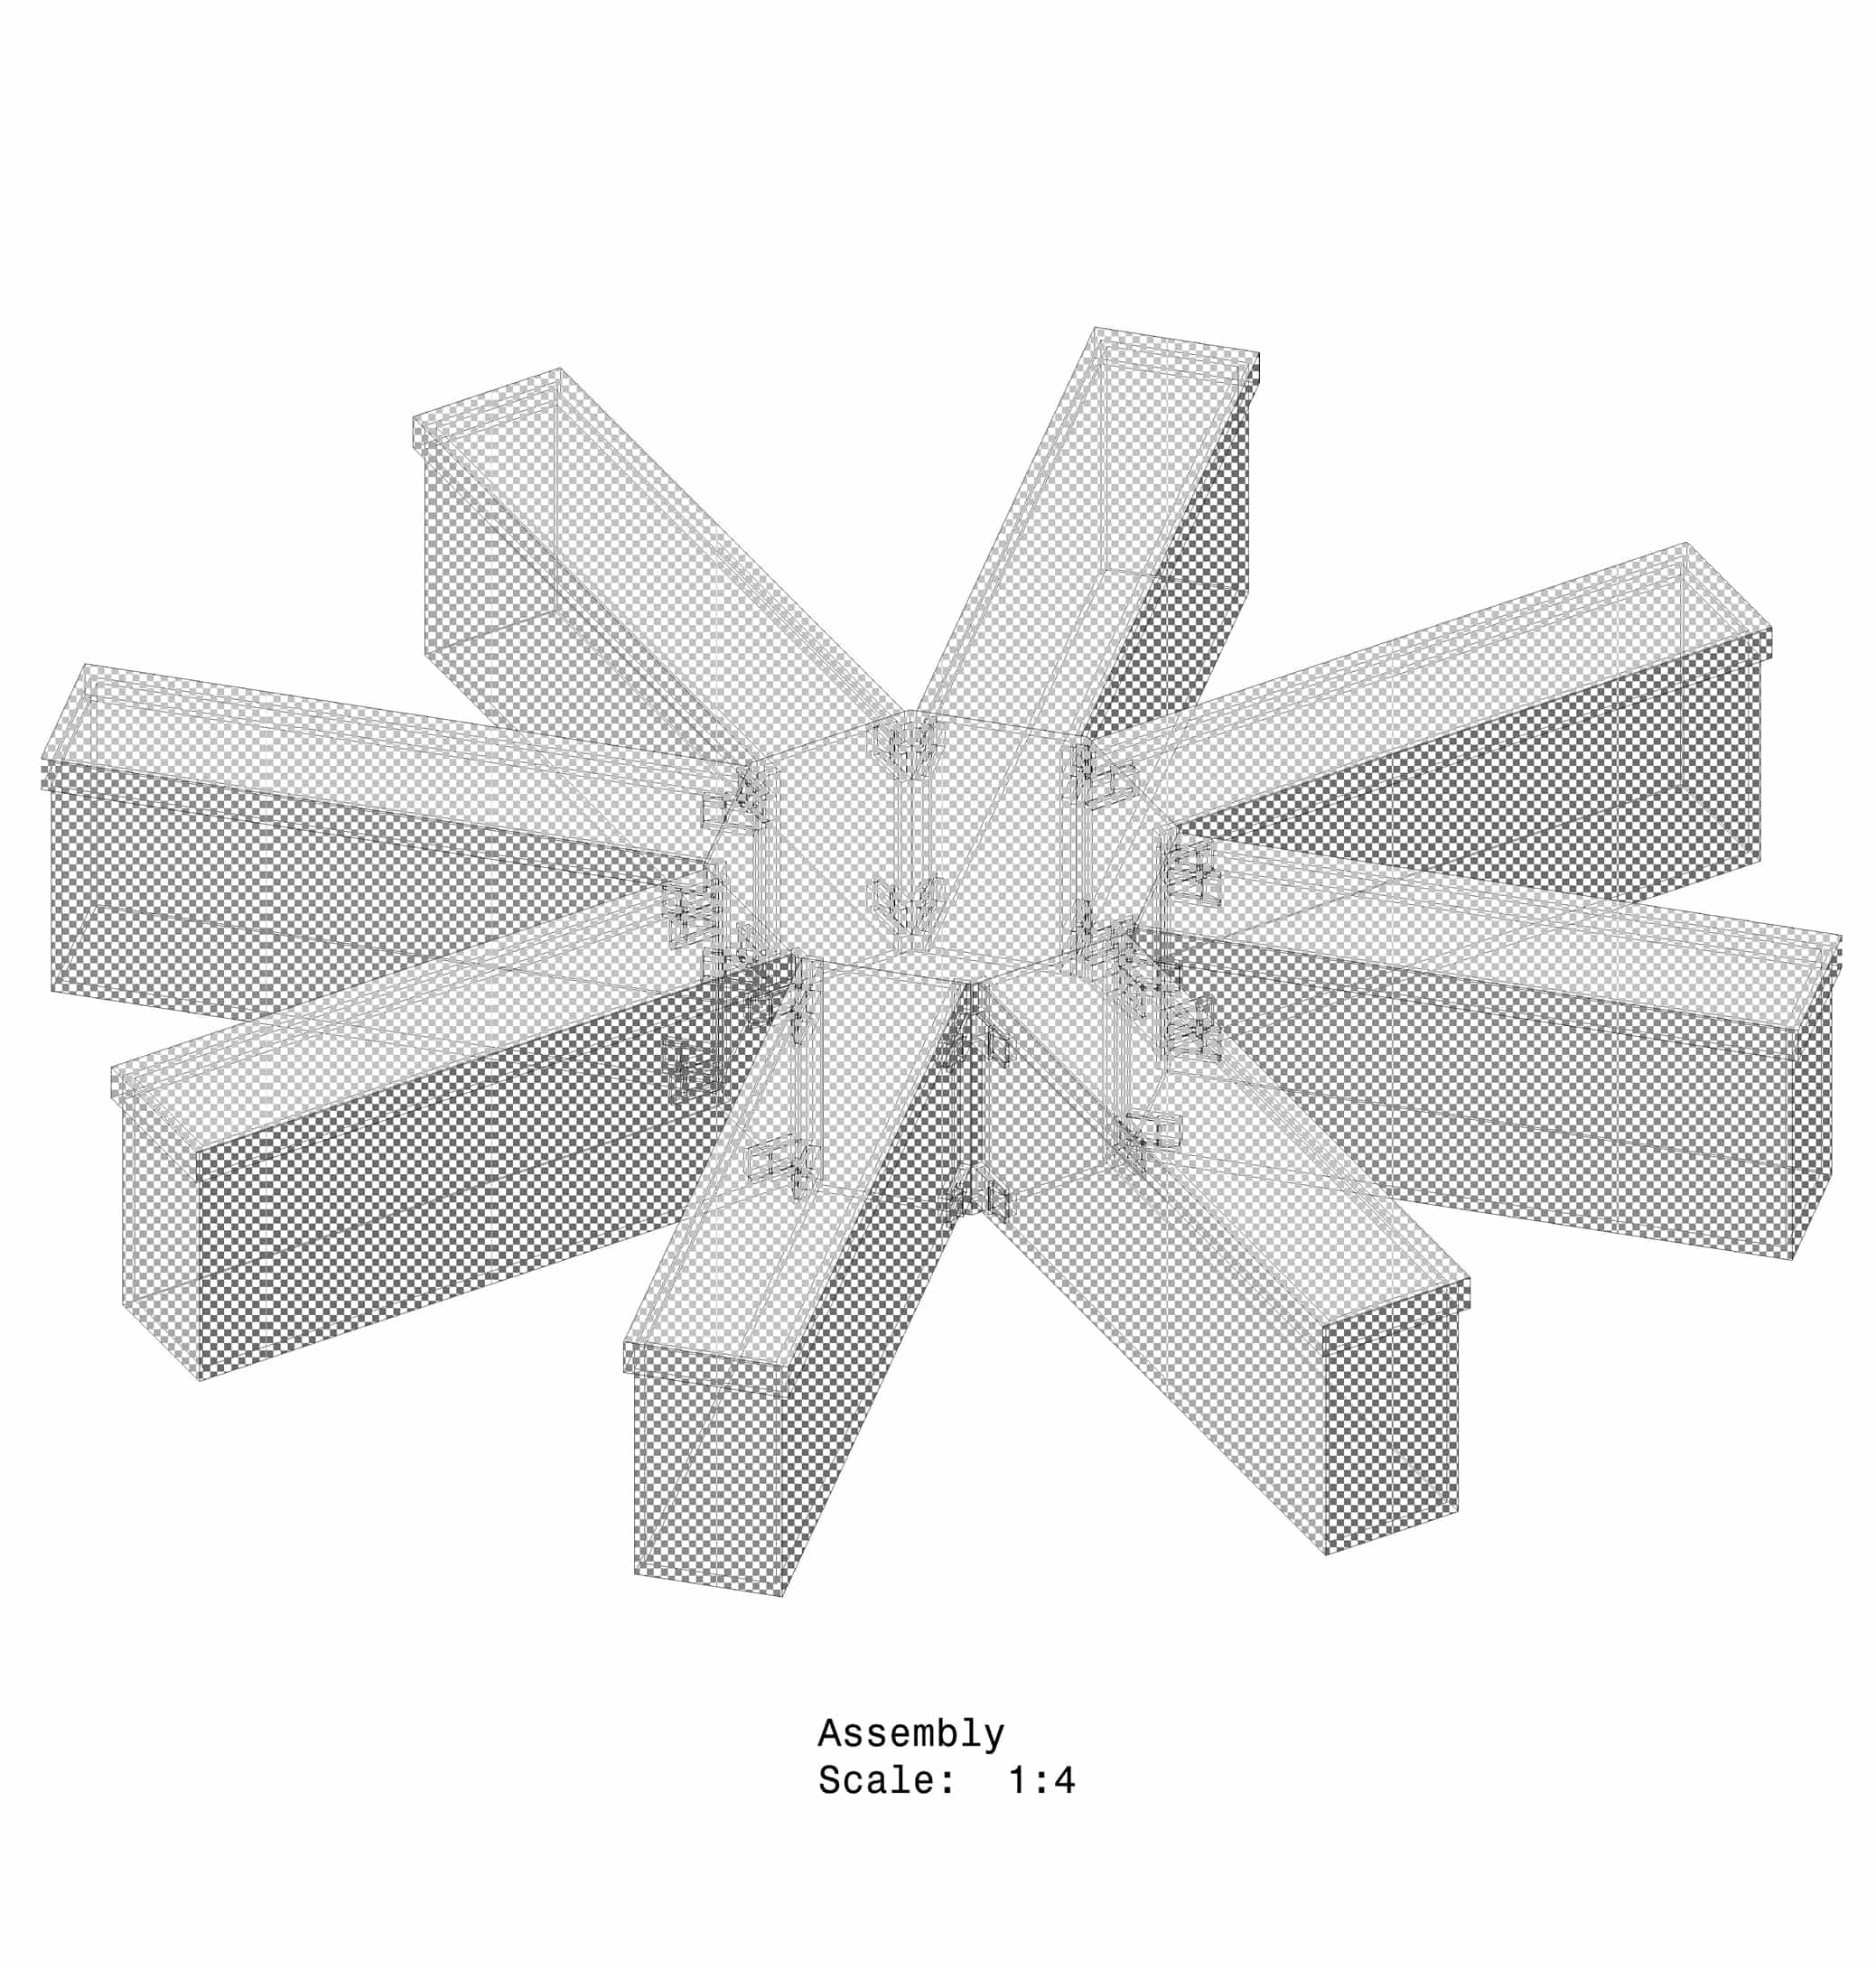 Radial Arm Maze - Removable Model - Rat (Image 1)